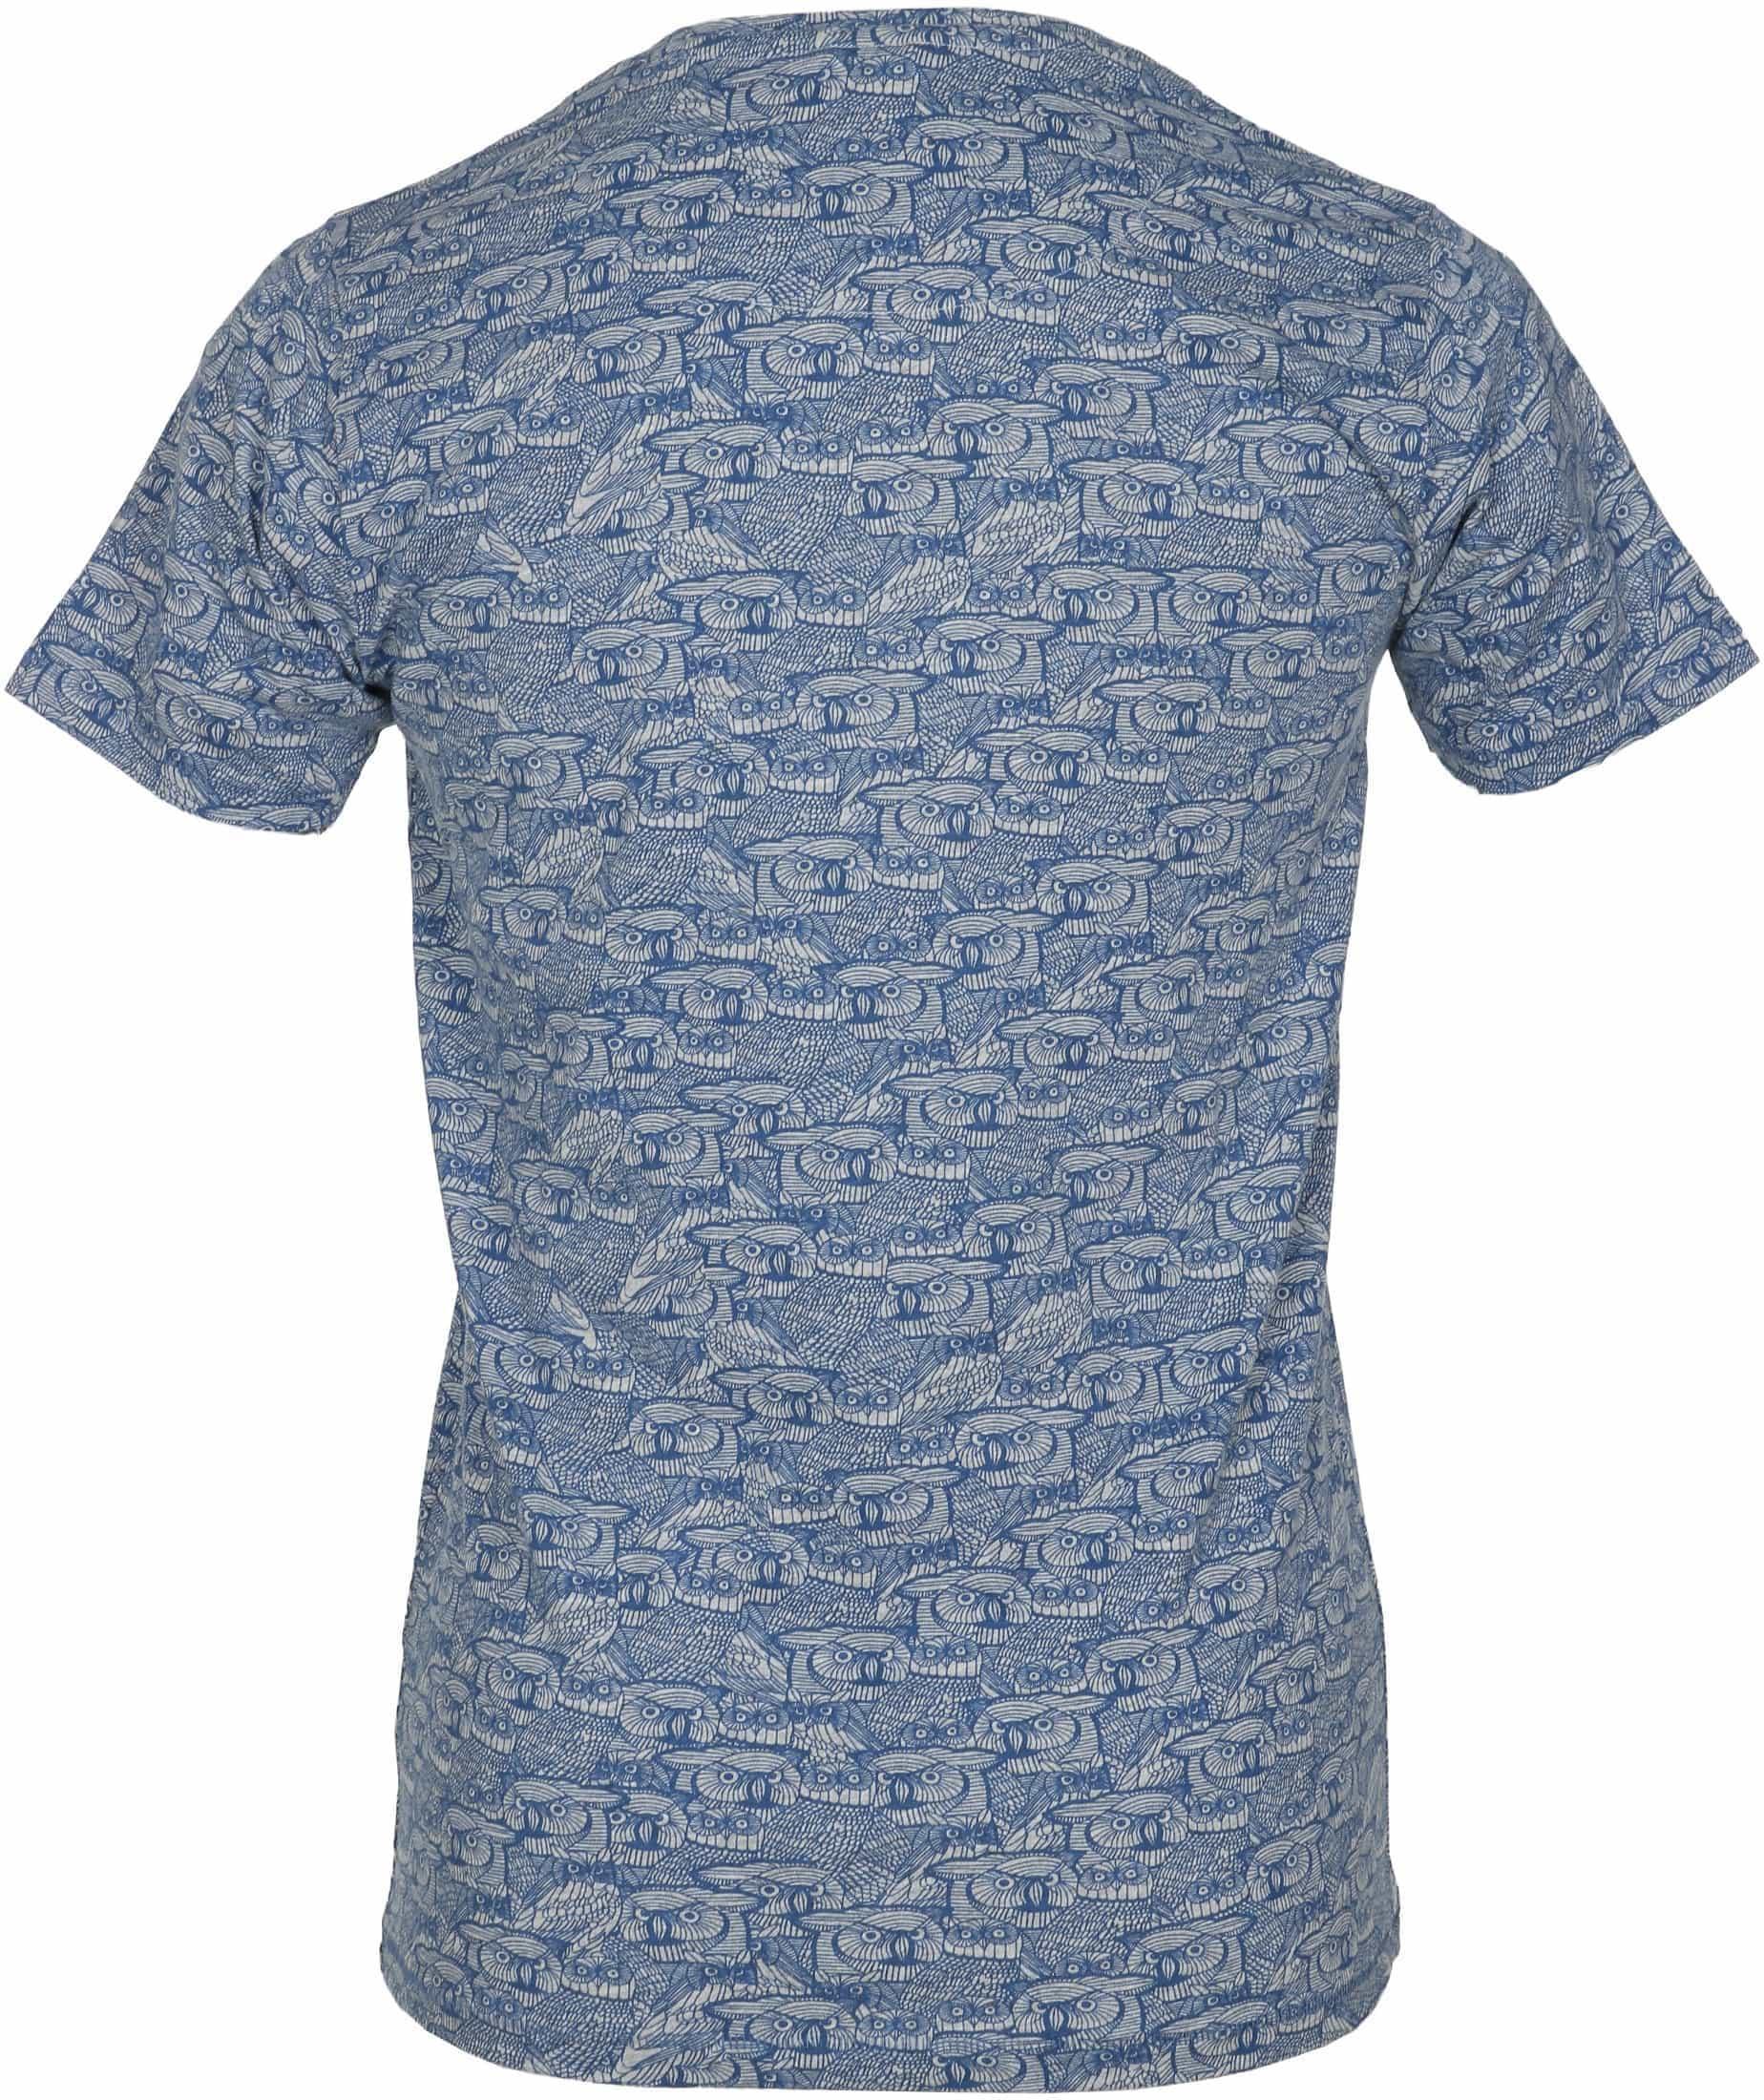 Dstrezzed T-shirt Navy Uil foto 2